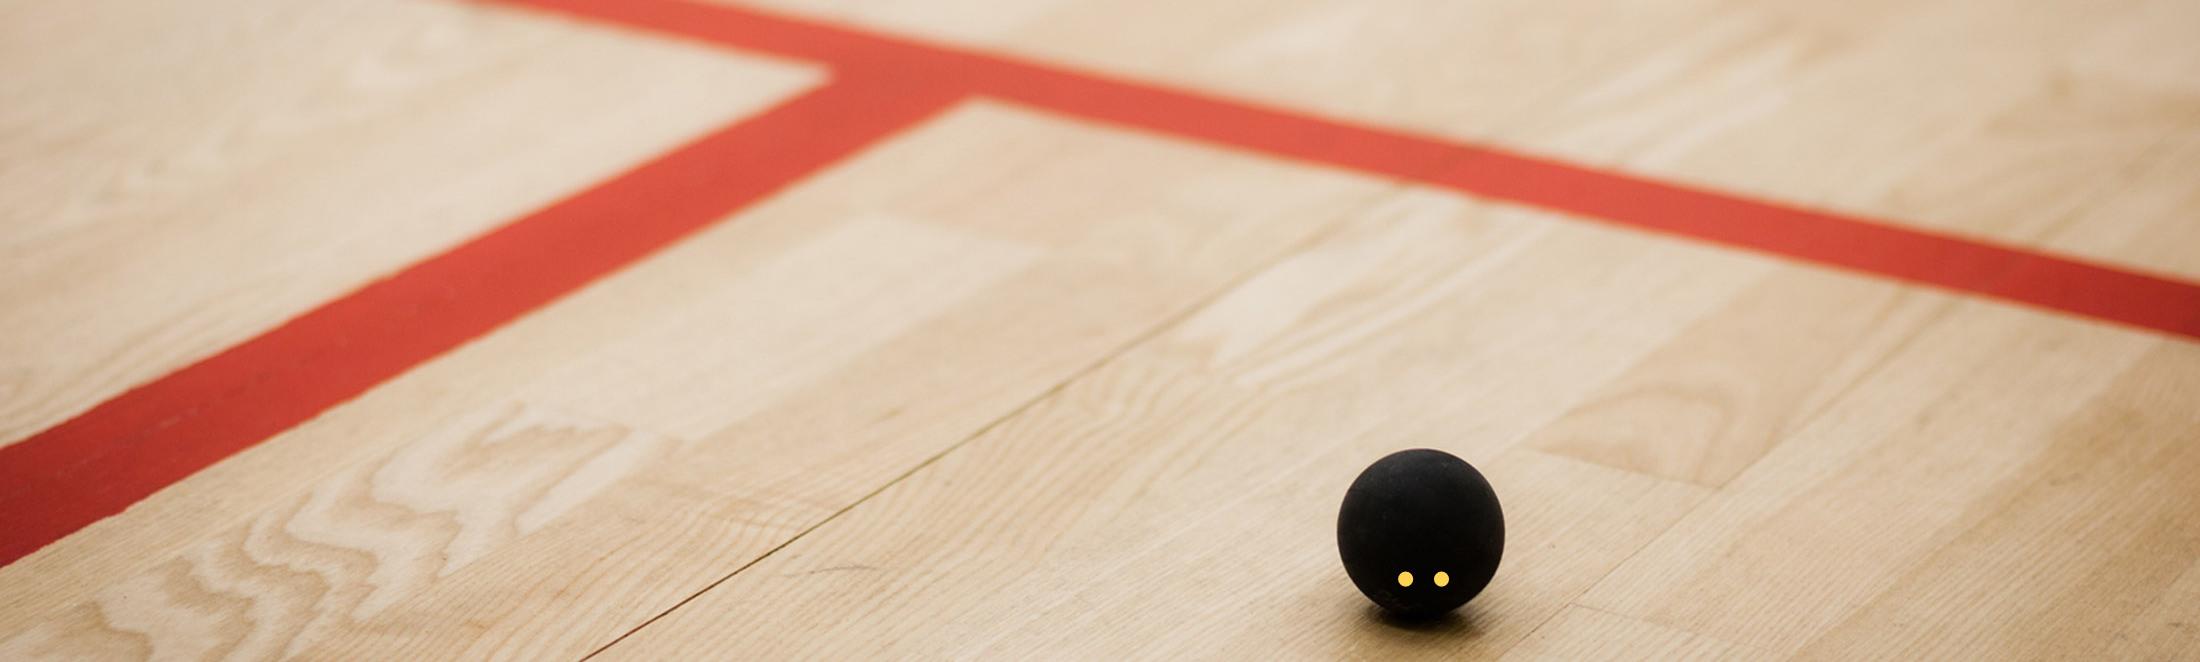 ball_court_background